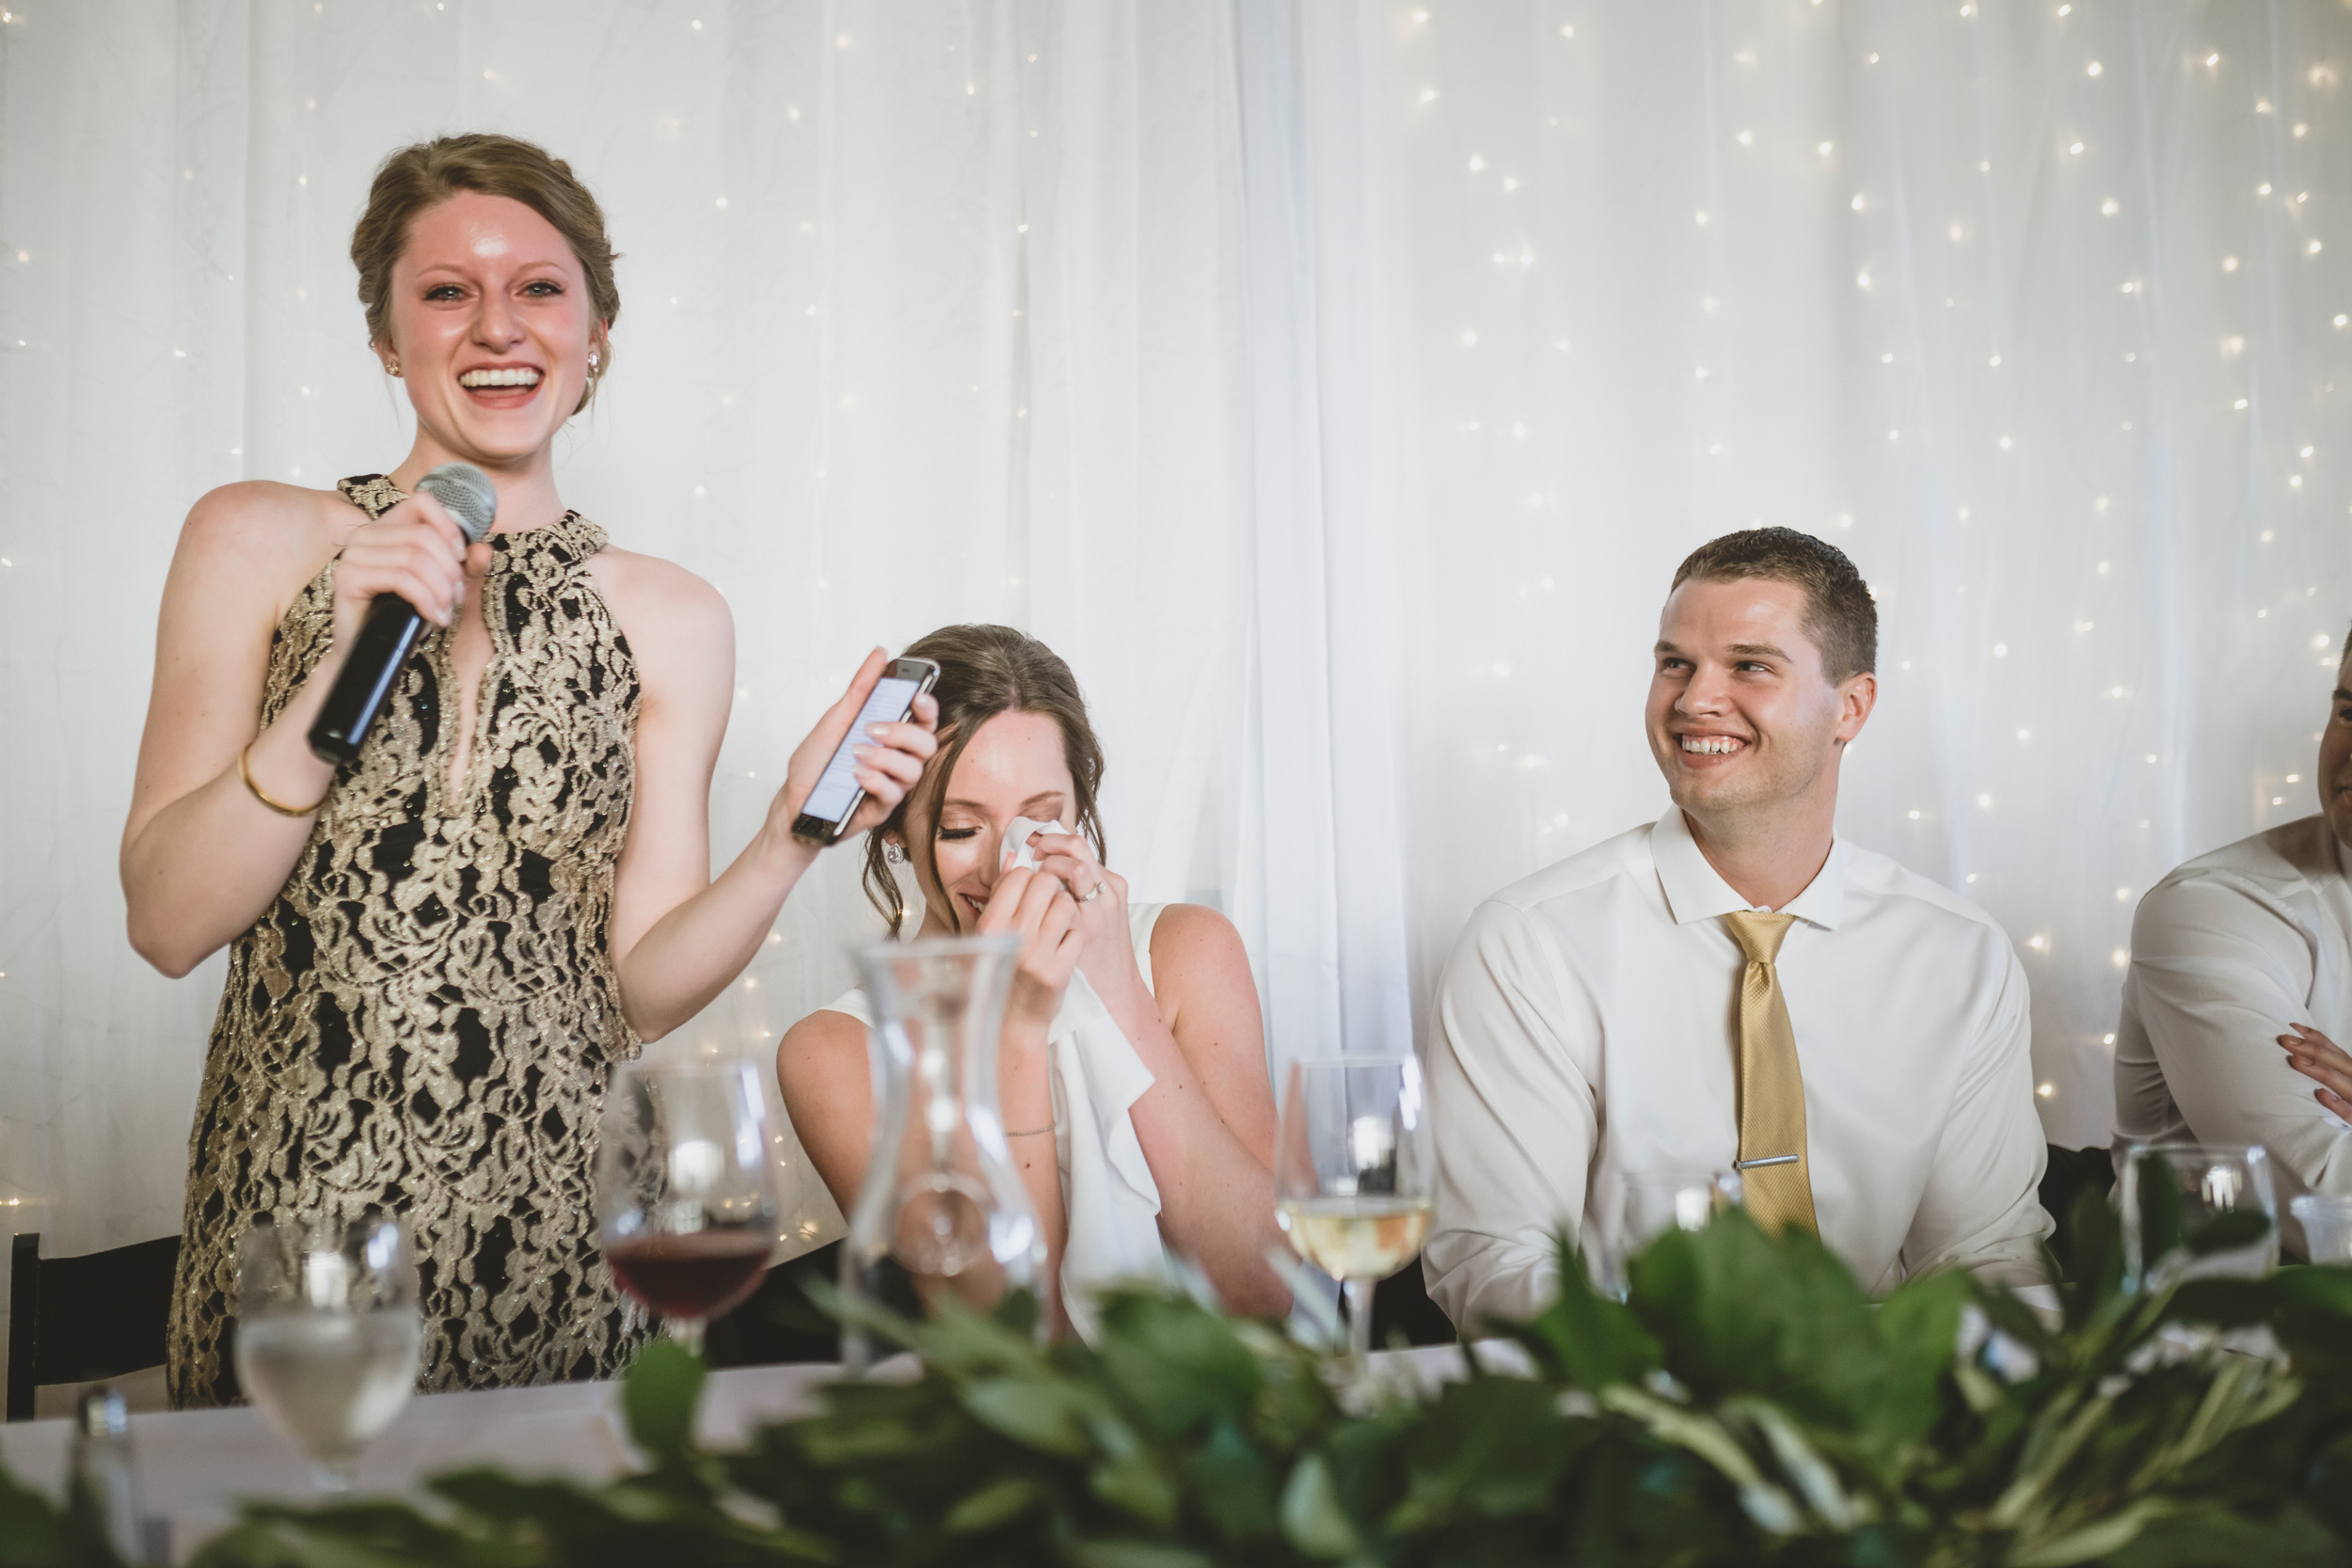 five event center uptown minneapolis wedding-60.jpg